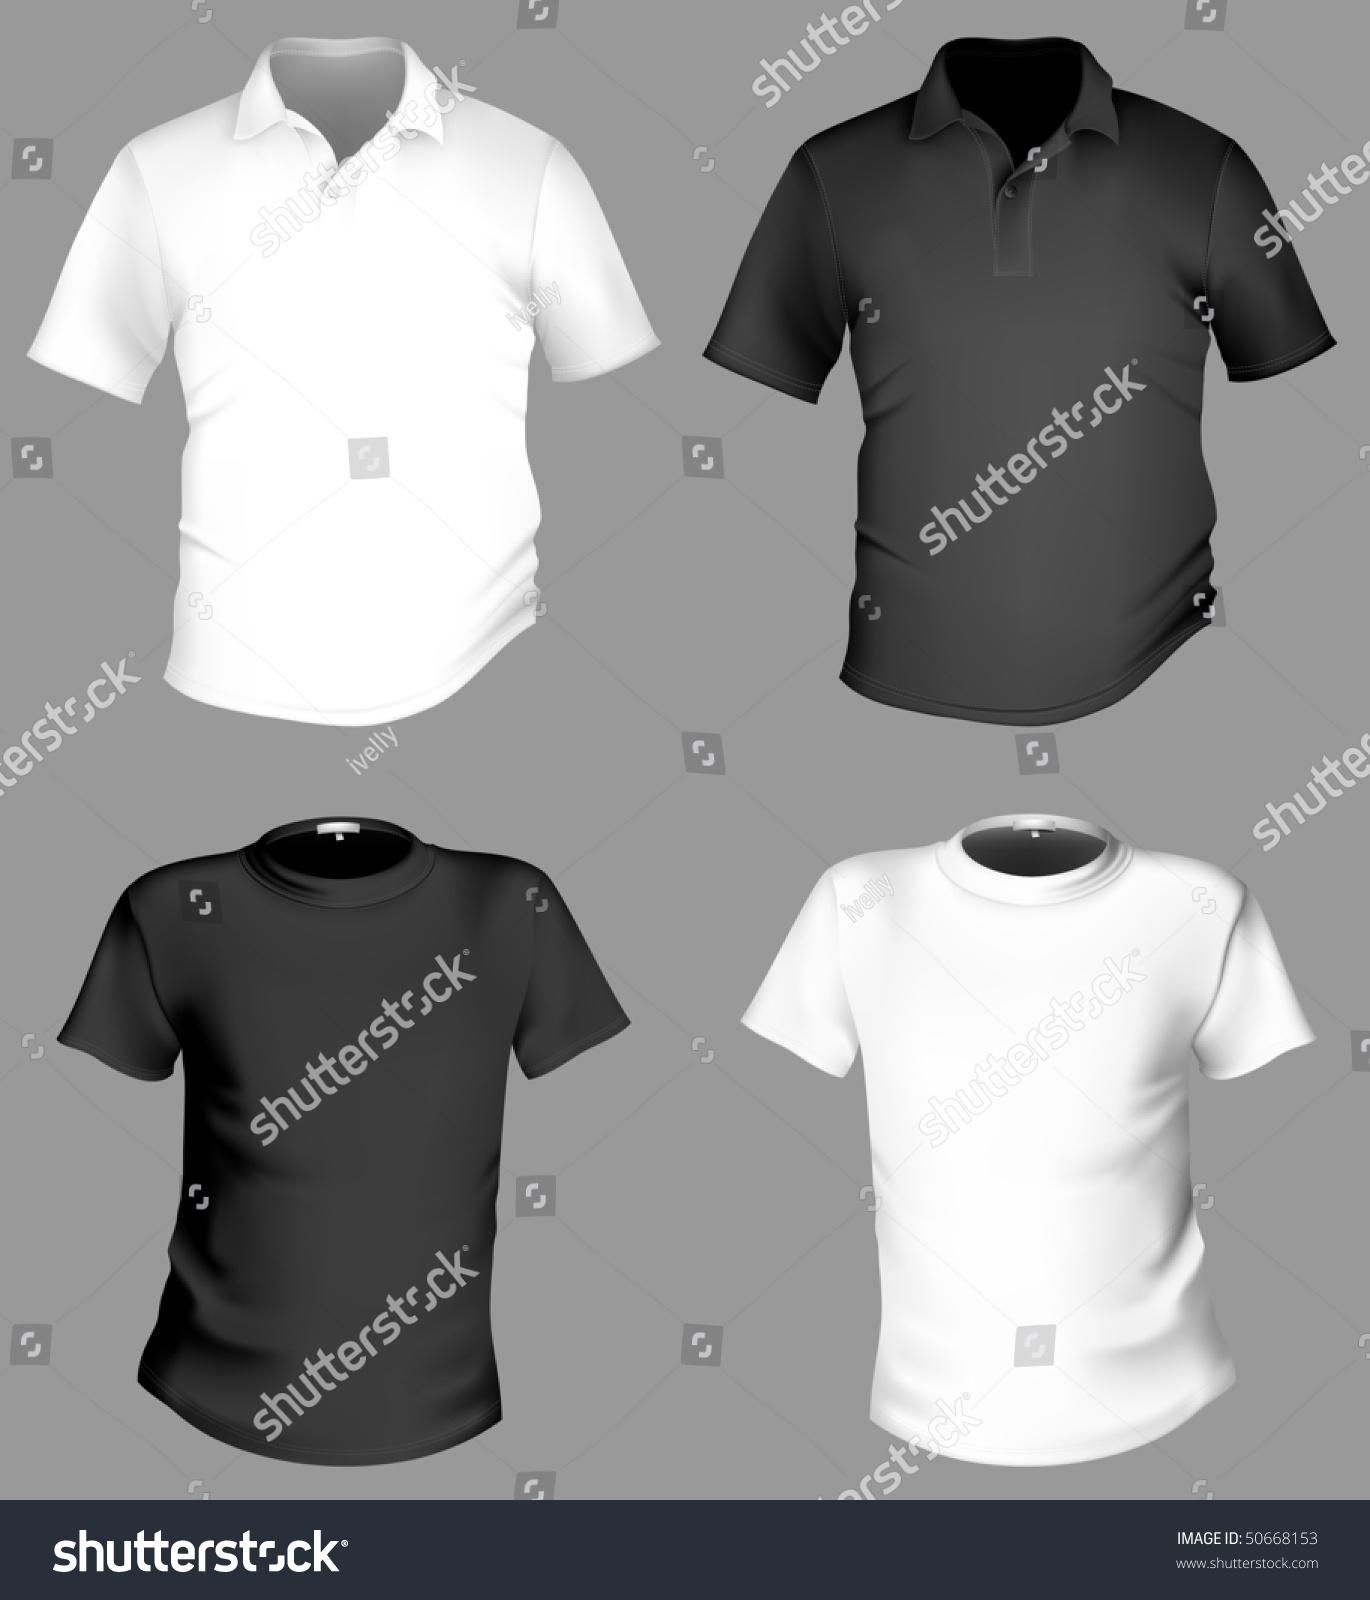 Black t shirt template - Men S Black And White T Shirt And Polo Shirt Template